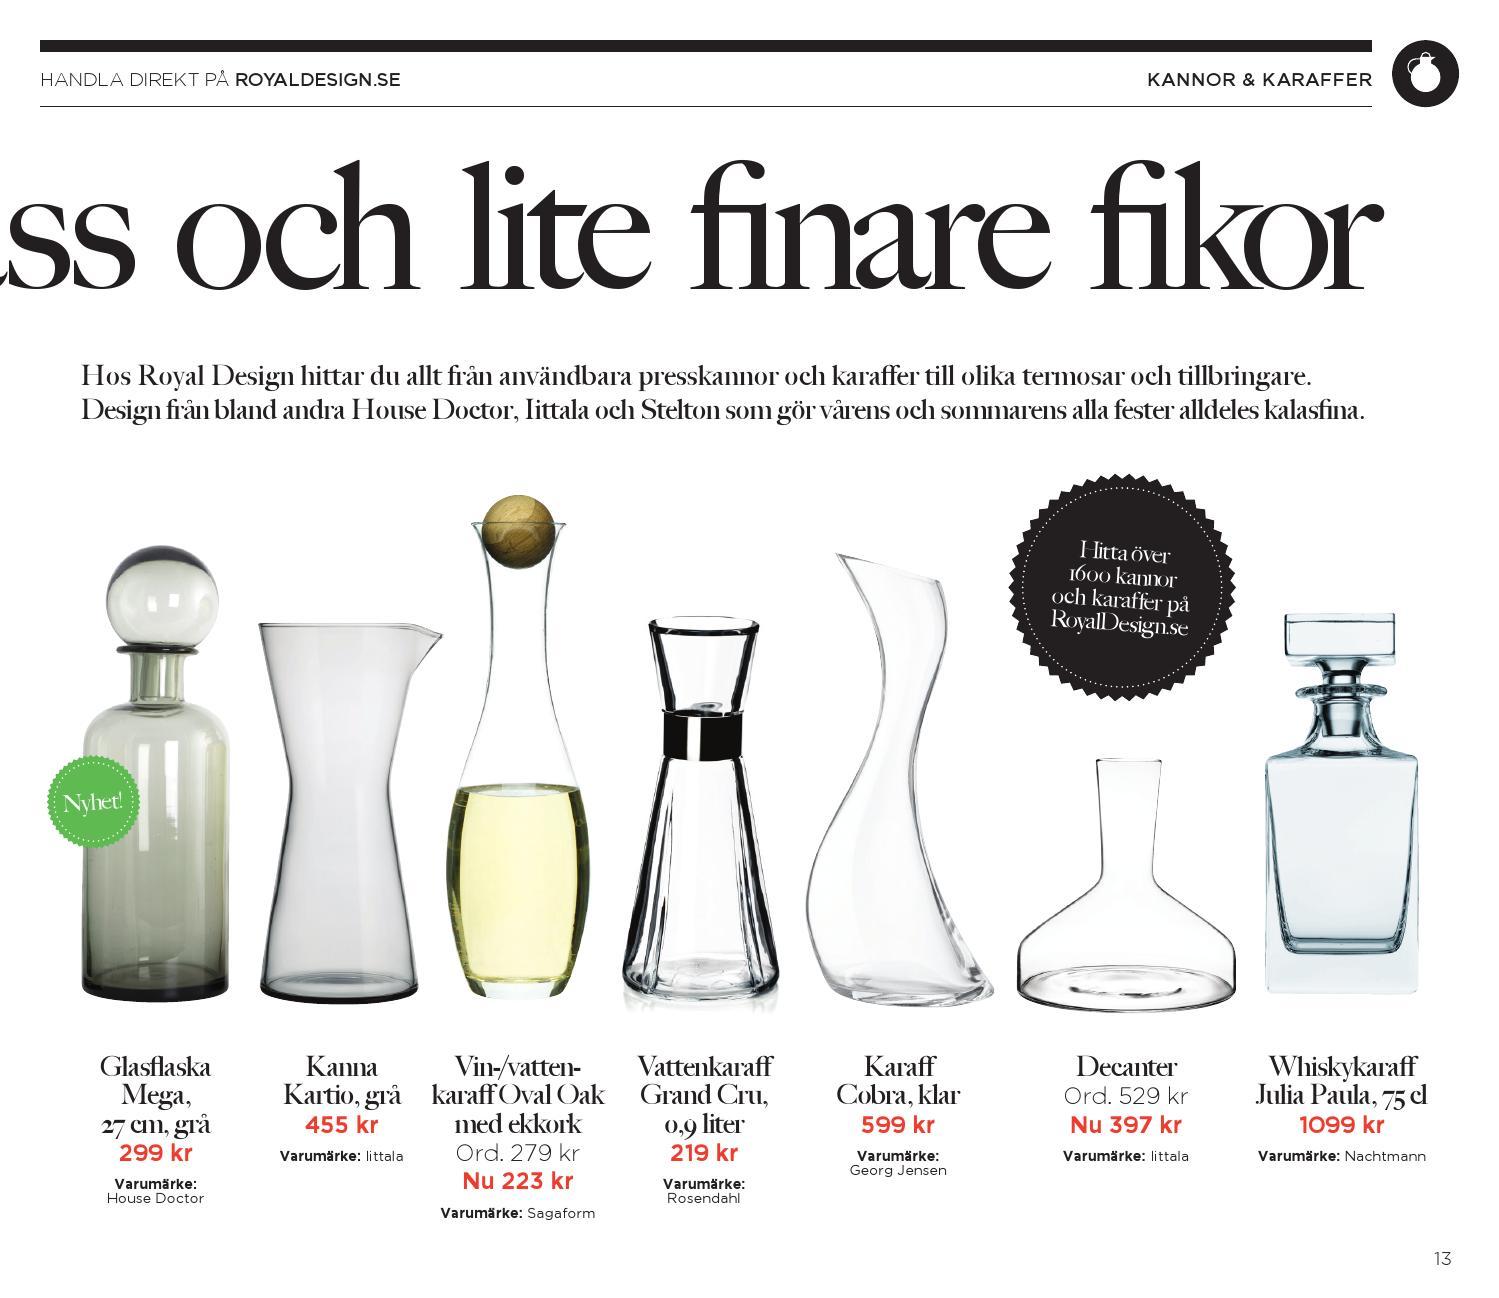 Mon Amie Kopp, 14 cl - Rörstrand @ RoyalDesign.se